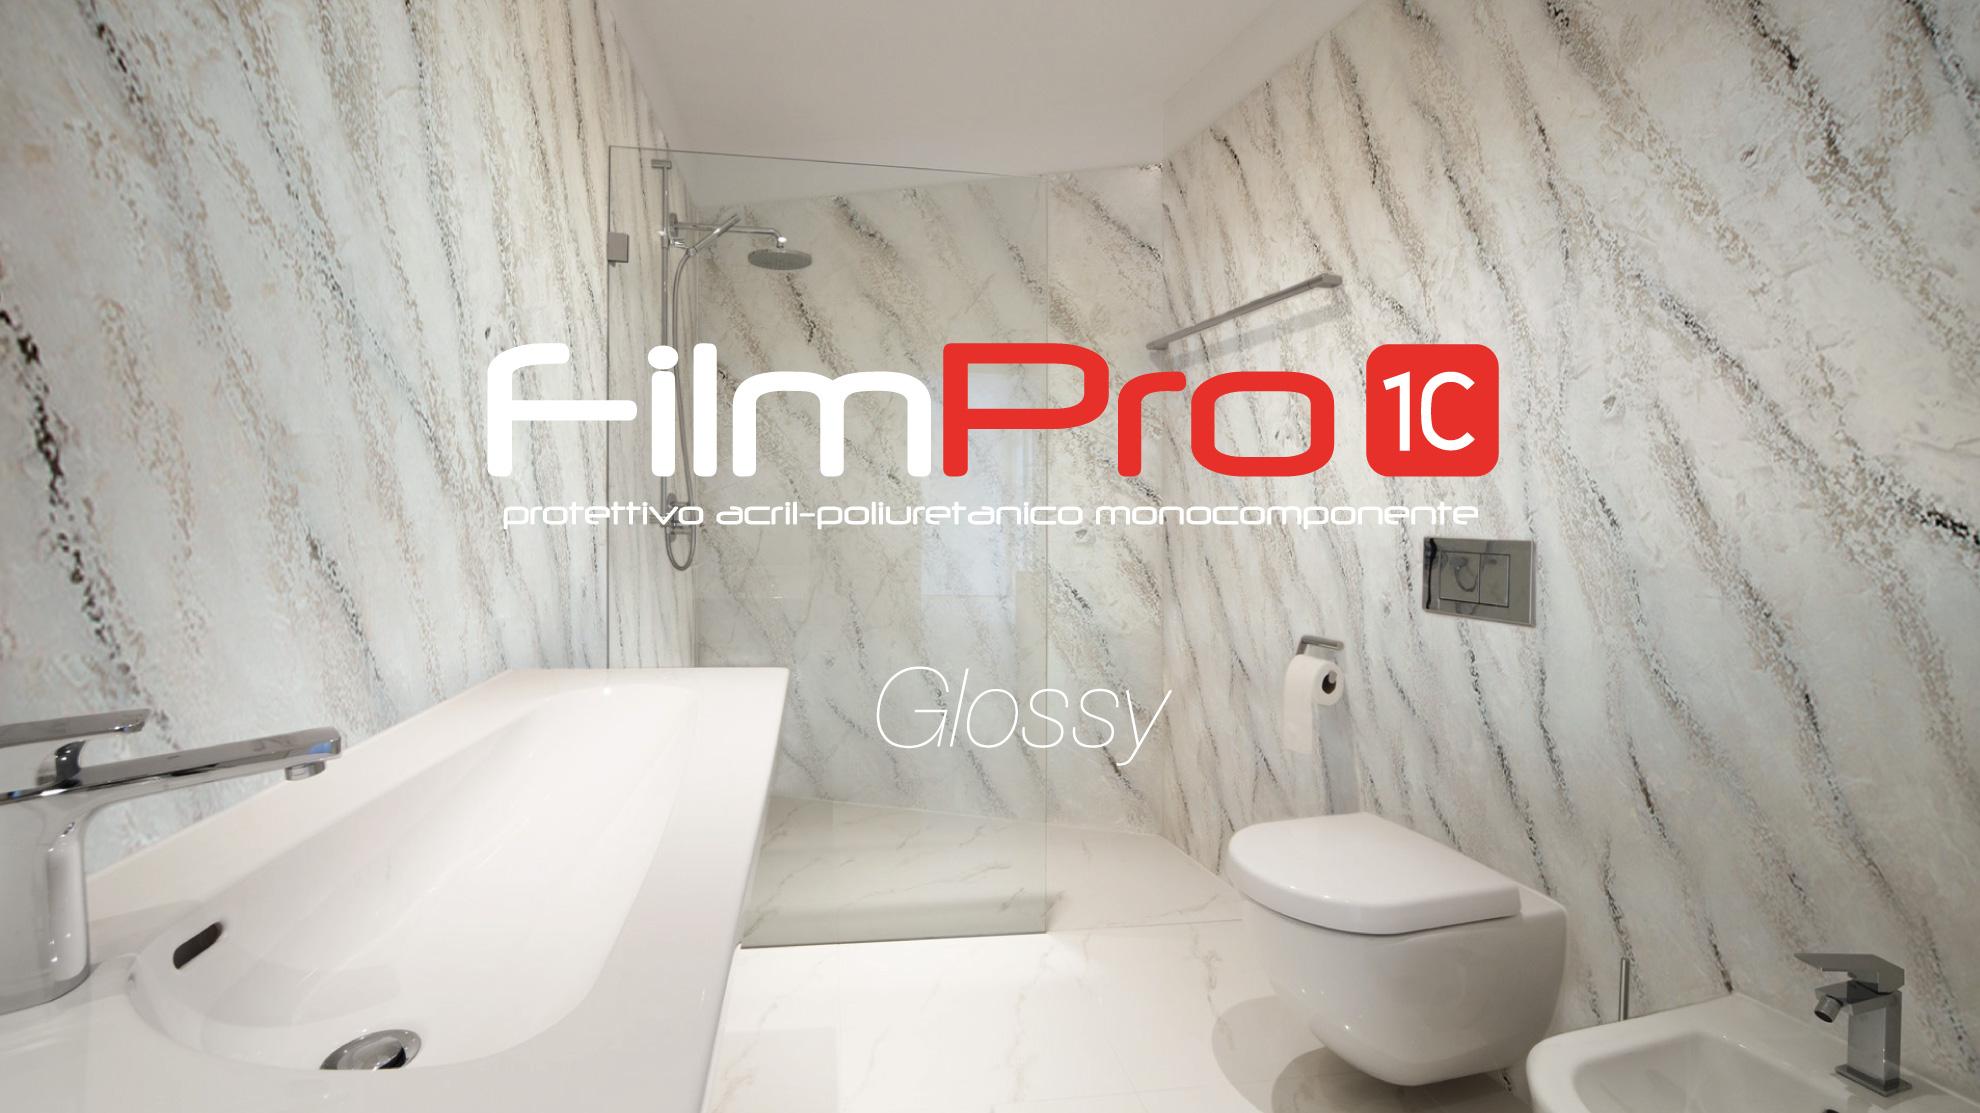 FilmPro 1C Glossy